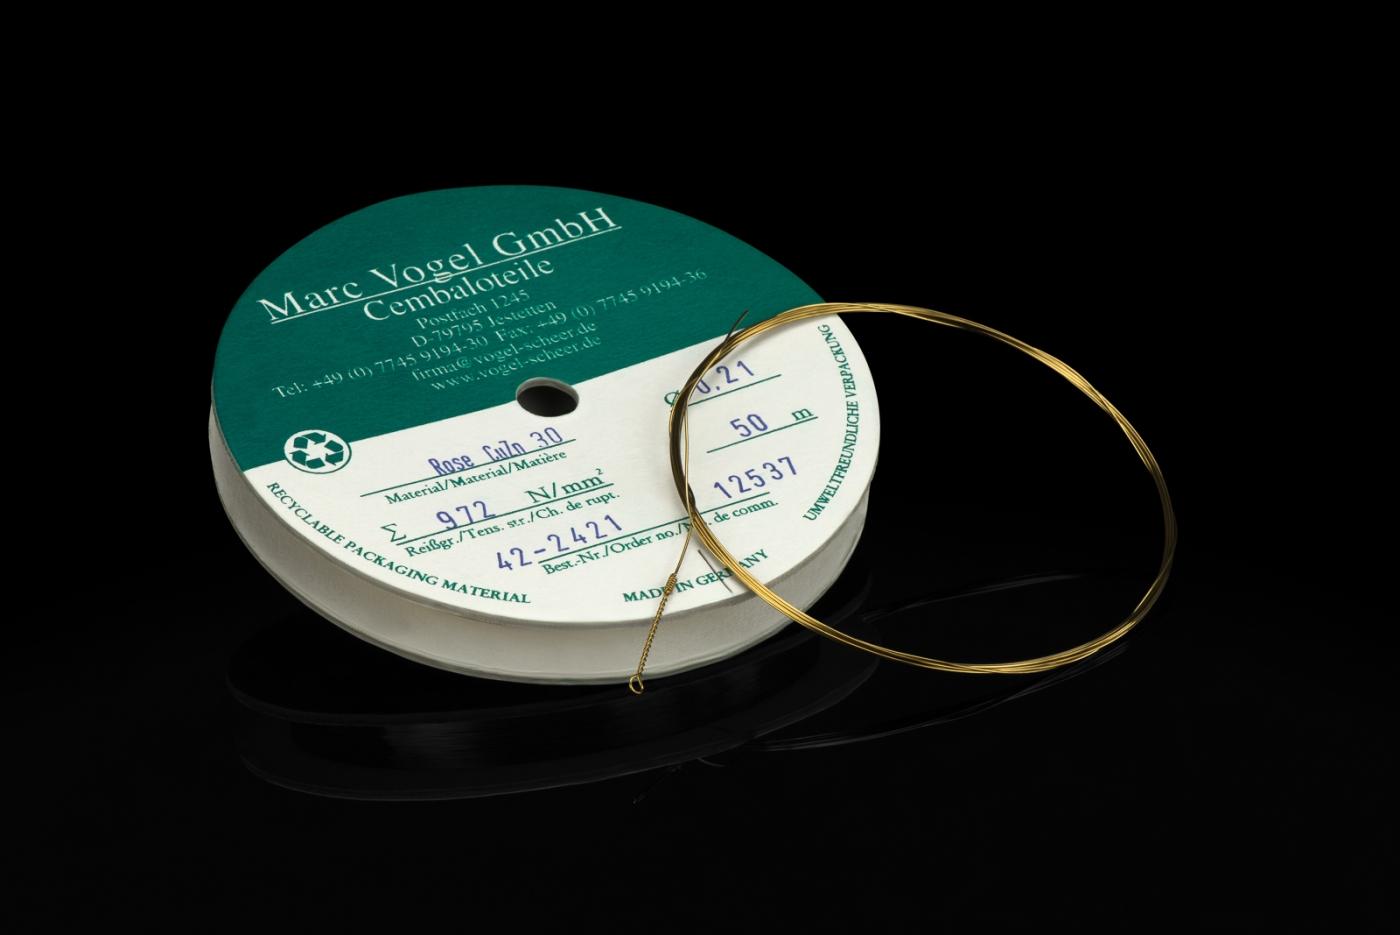 Marc Vogel Gmbh Rose Strings Cuzn30 Coil 50m